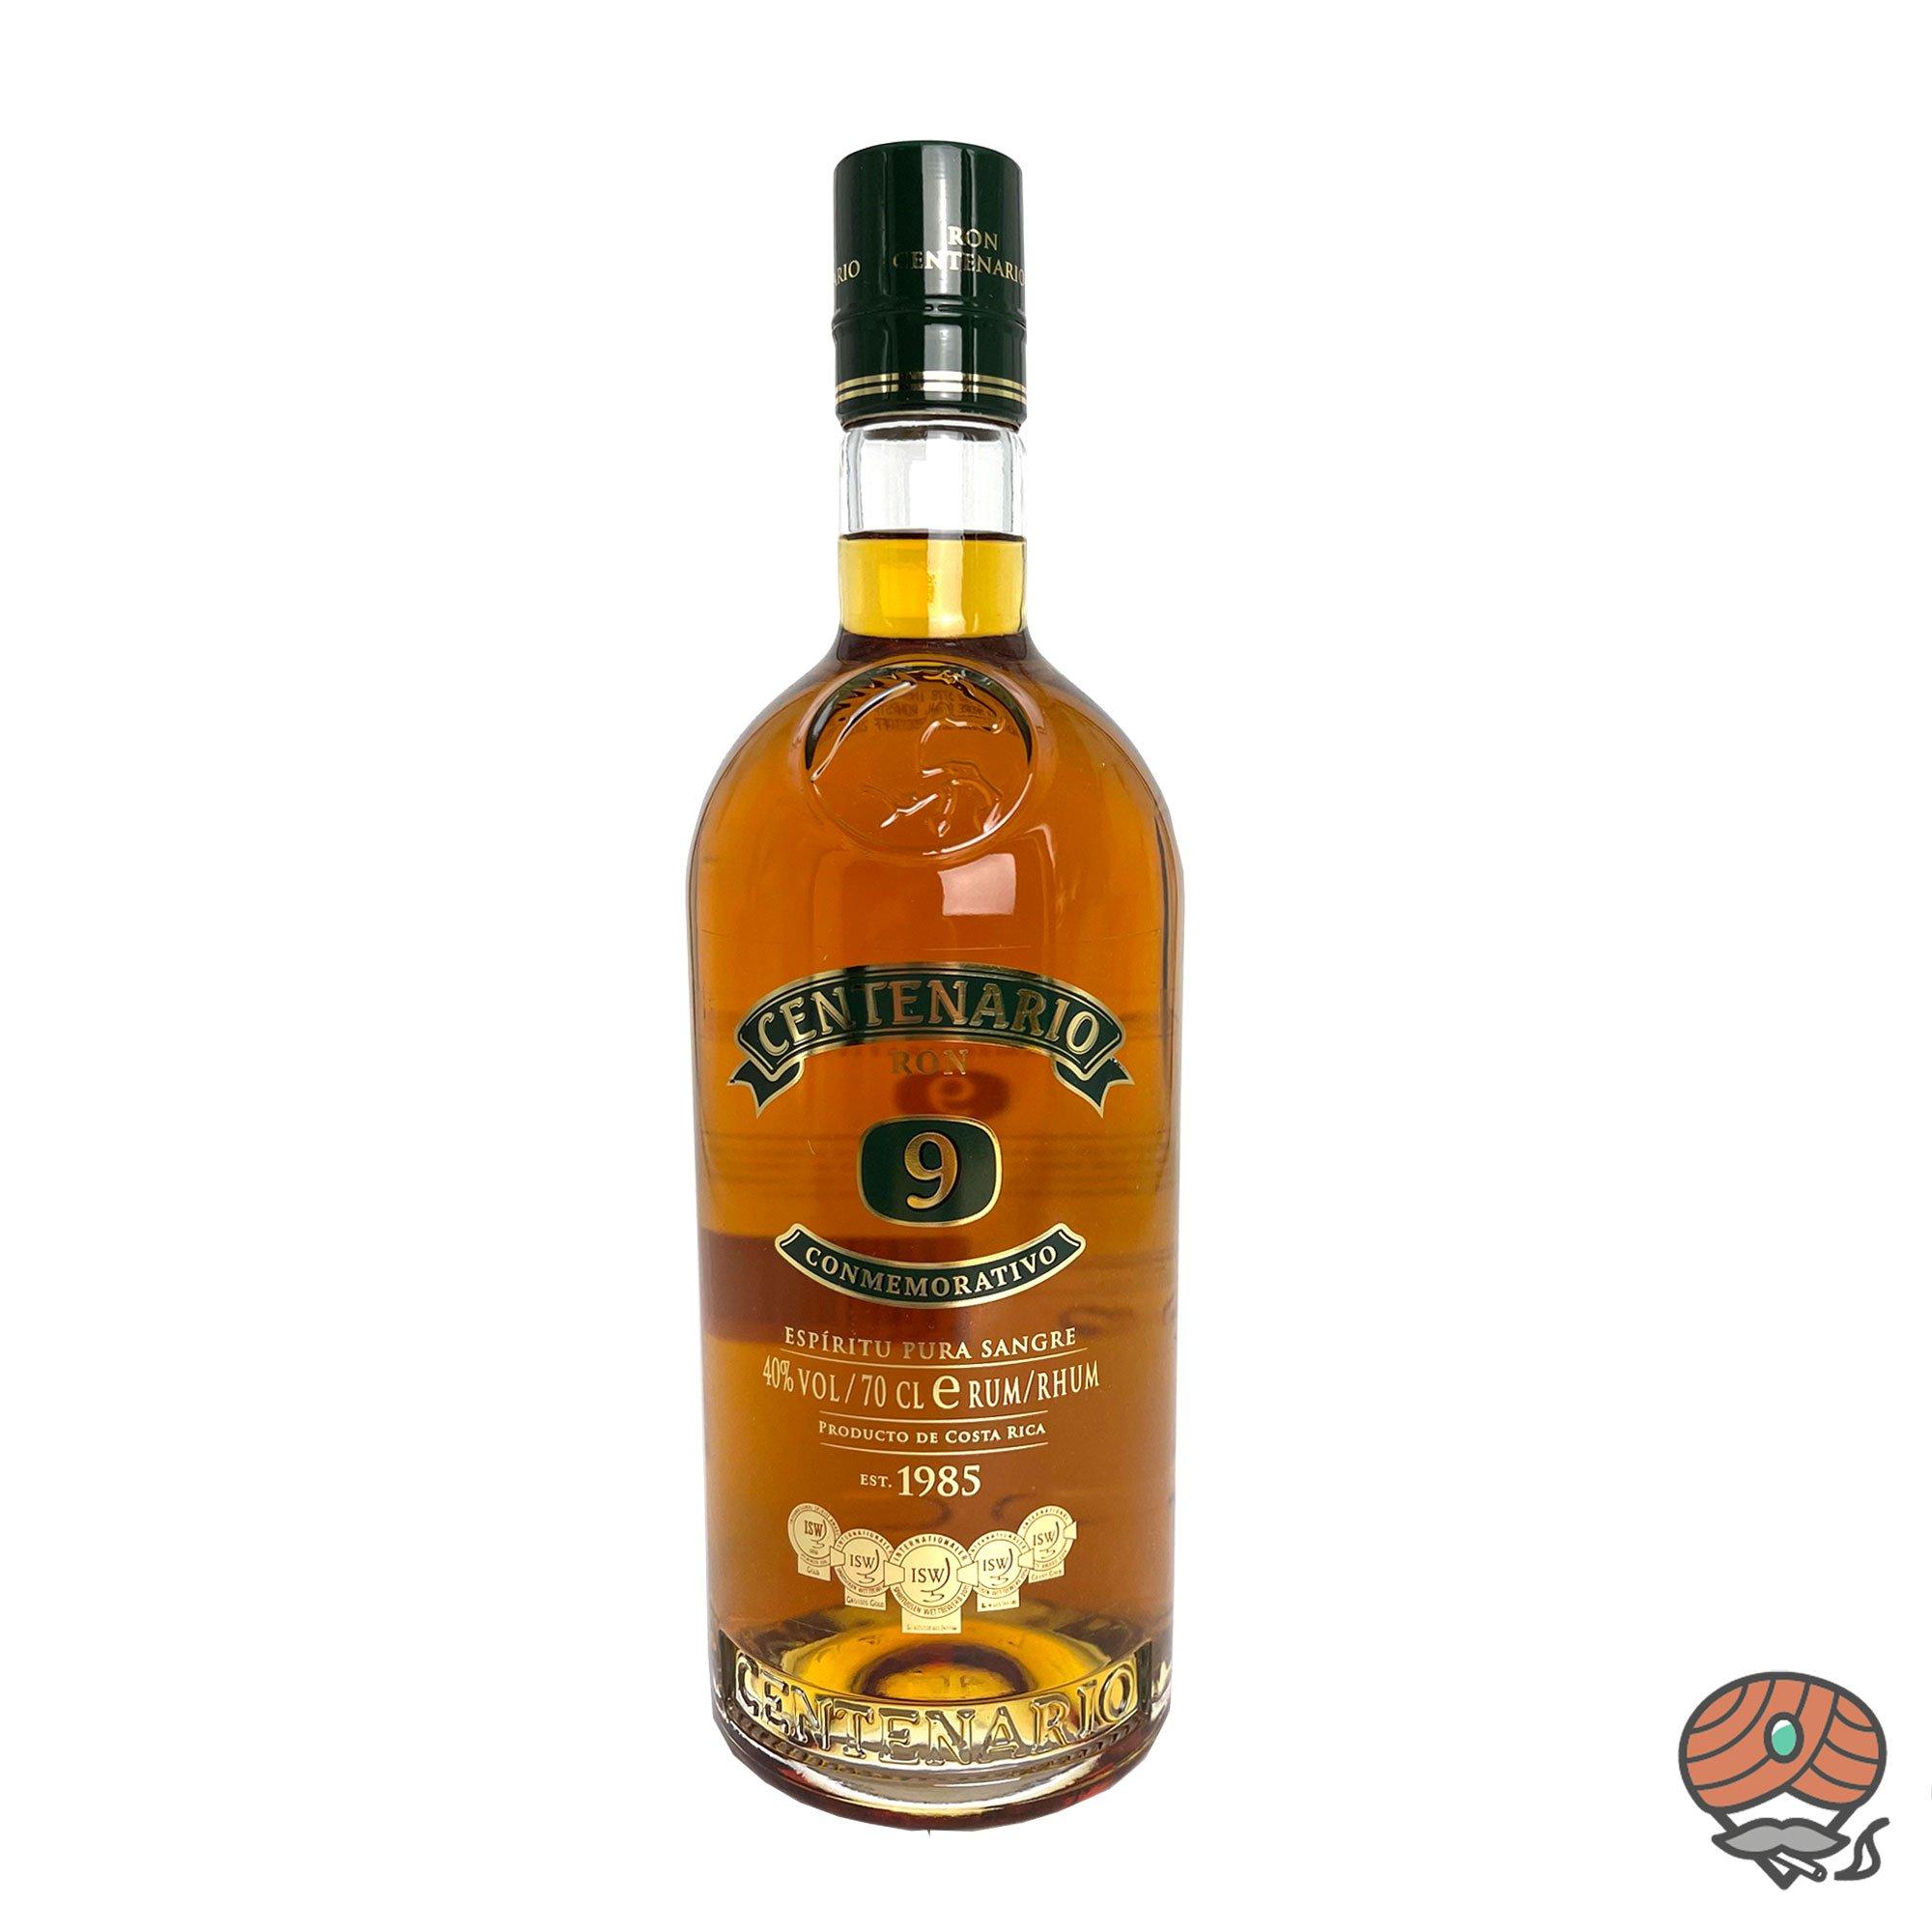 Centenario Ron 9 Conmemorative Rum (alc. 40% Vol)